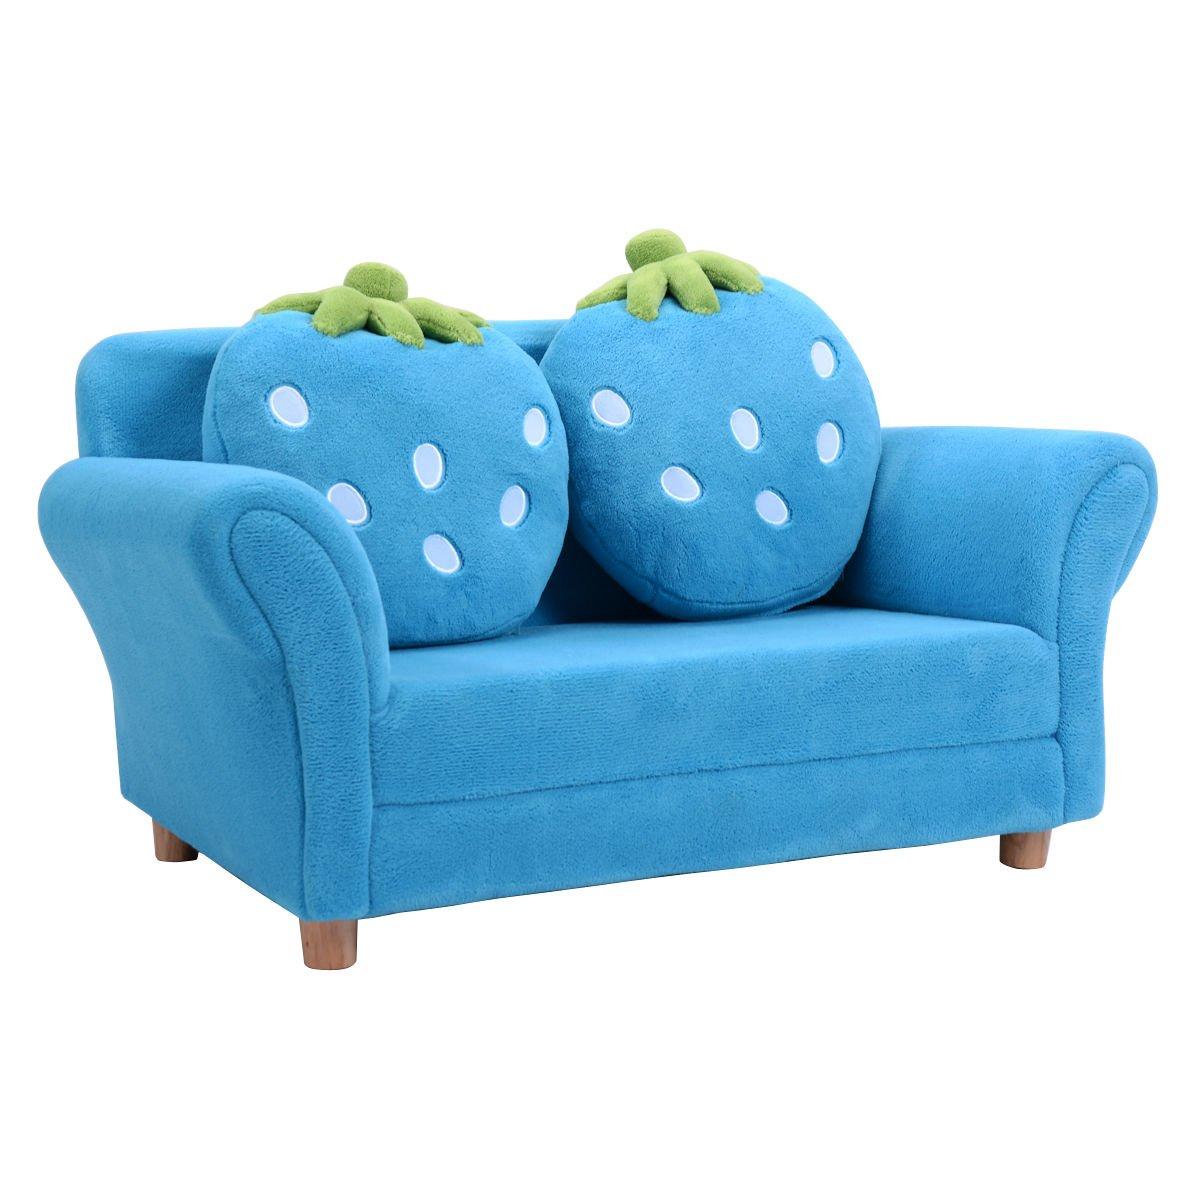 Costzon Kids Sofa Set Children Armrest Chair Lounge Couch w/2 Cushions (Blue)